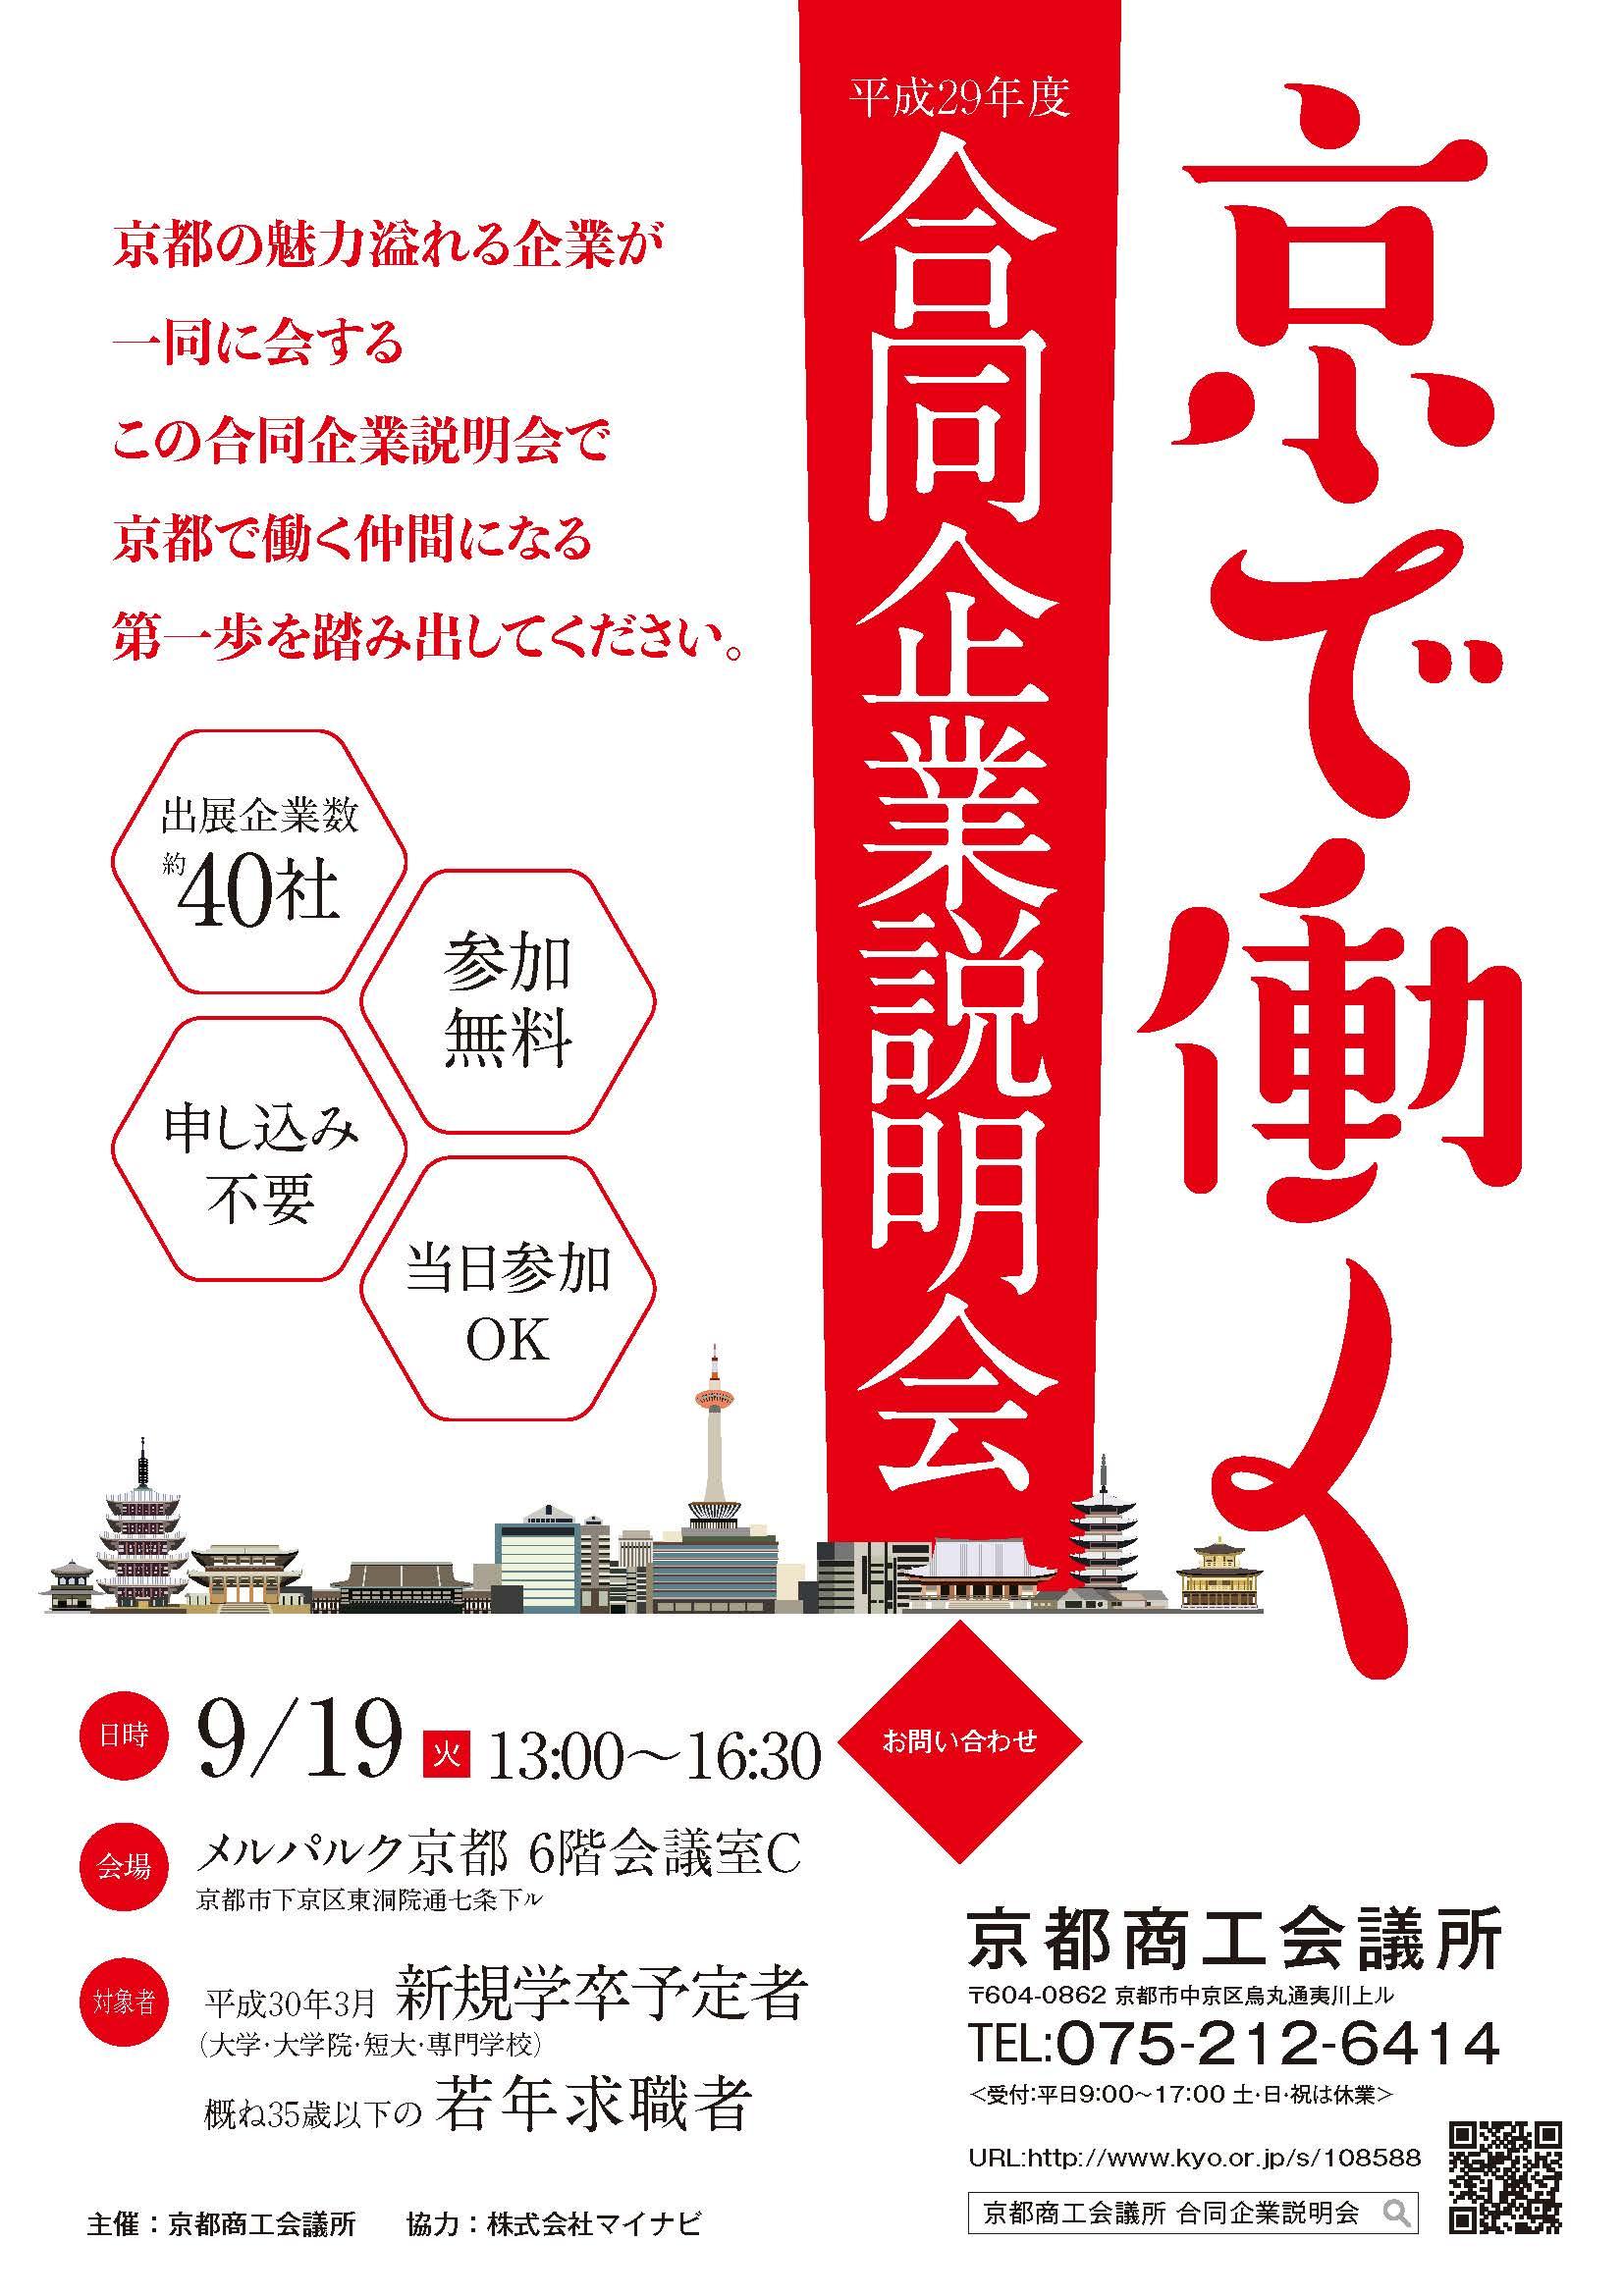 gousetsu29.jpg